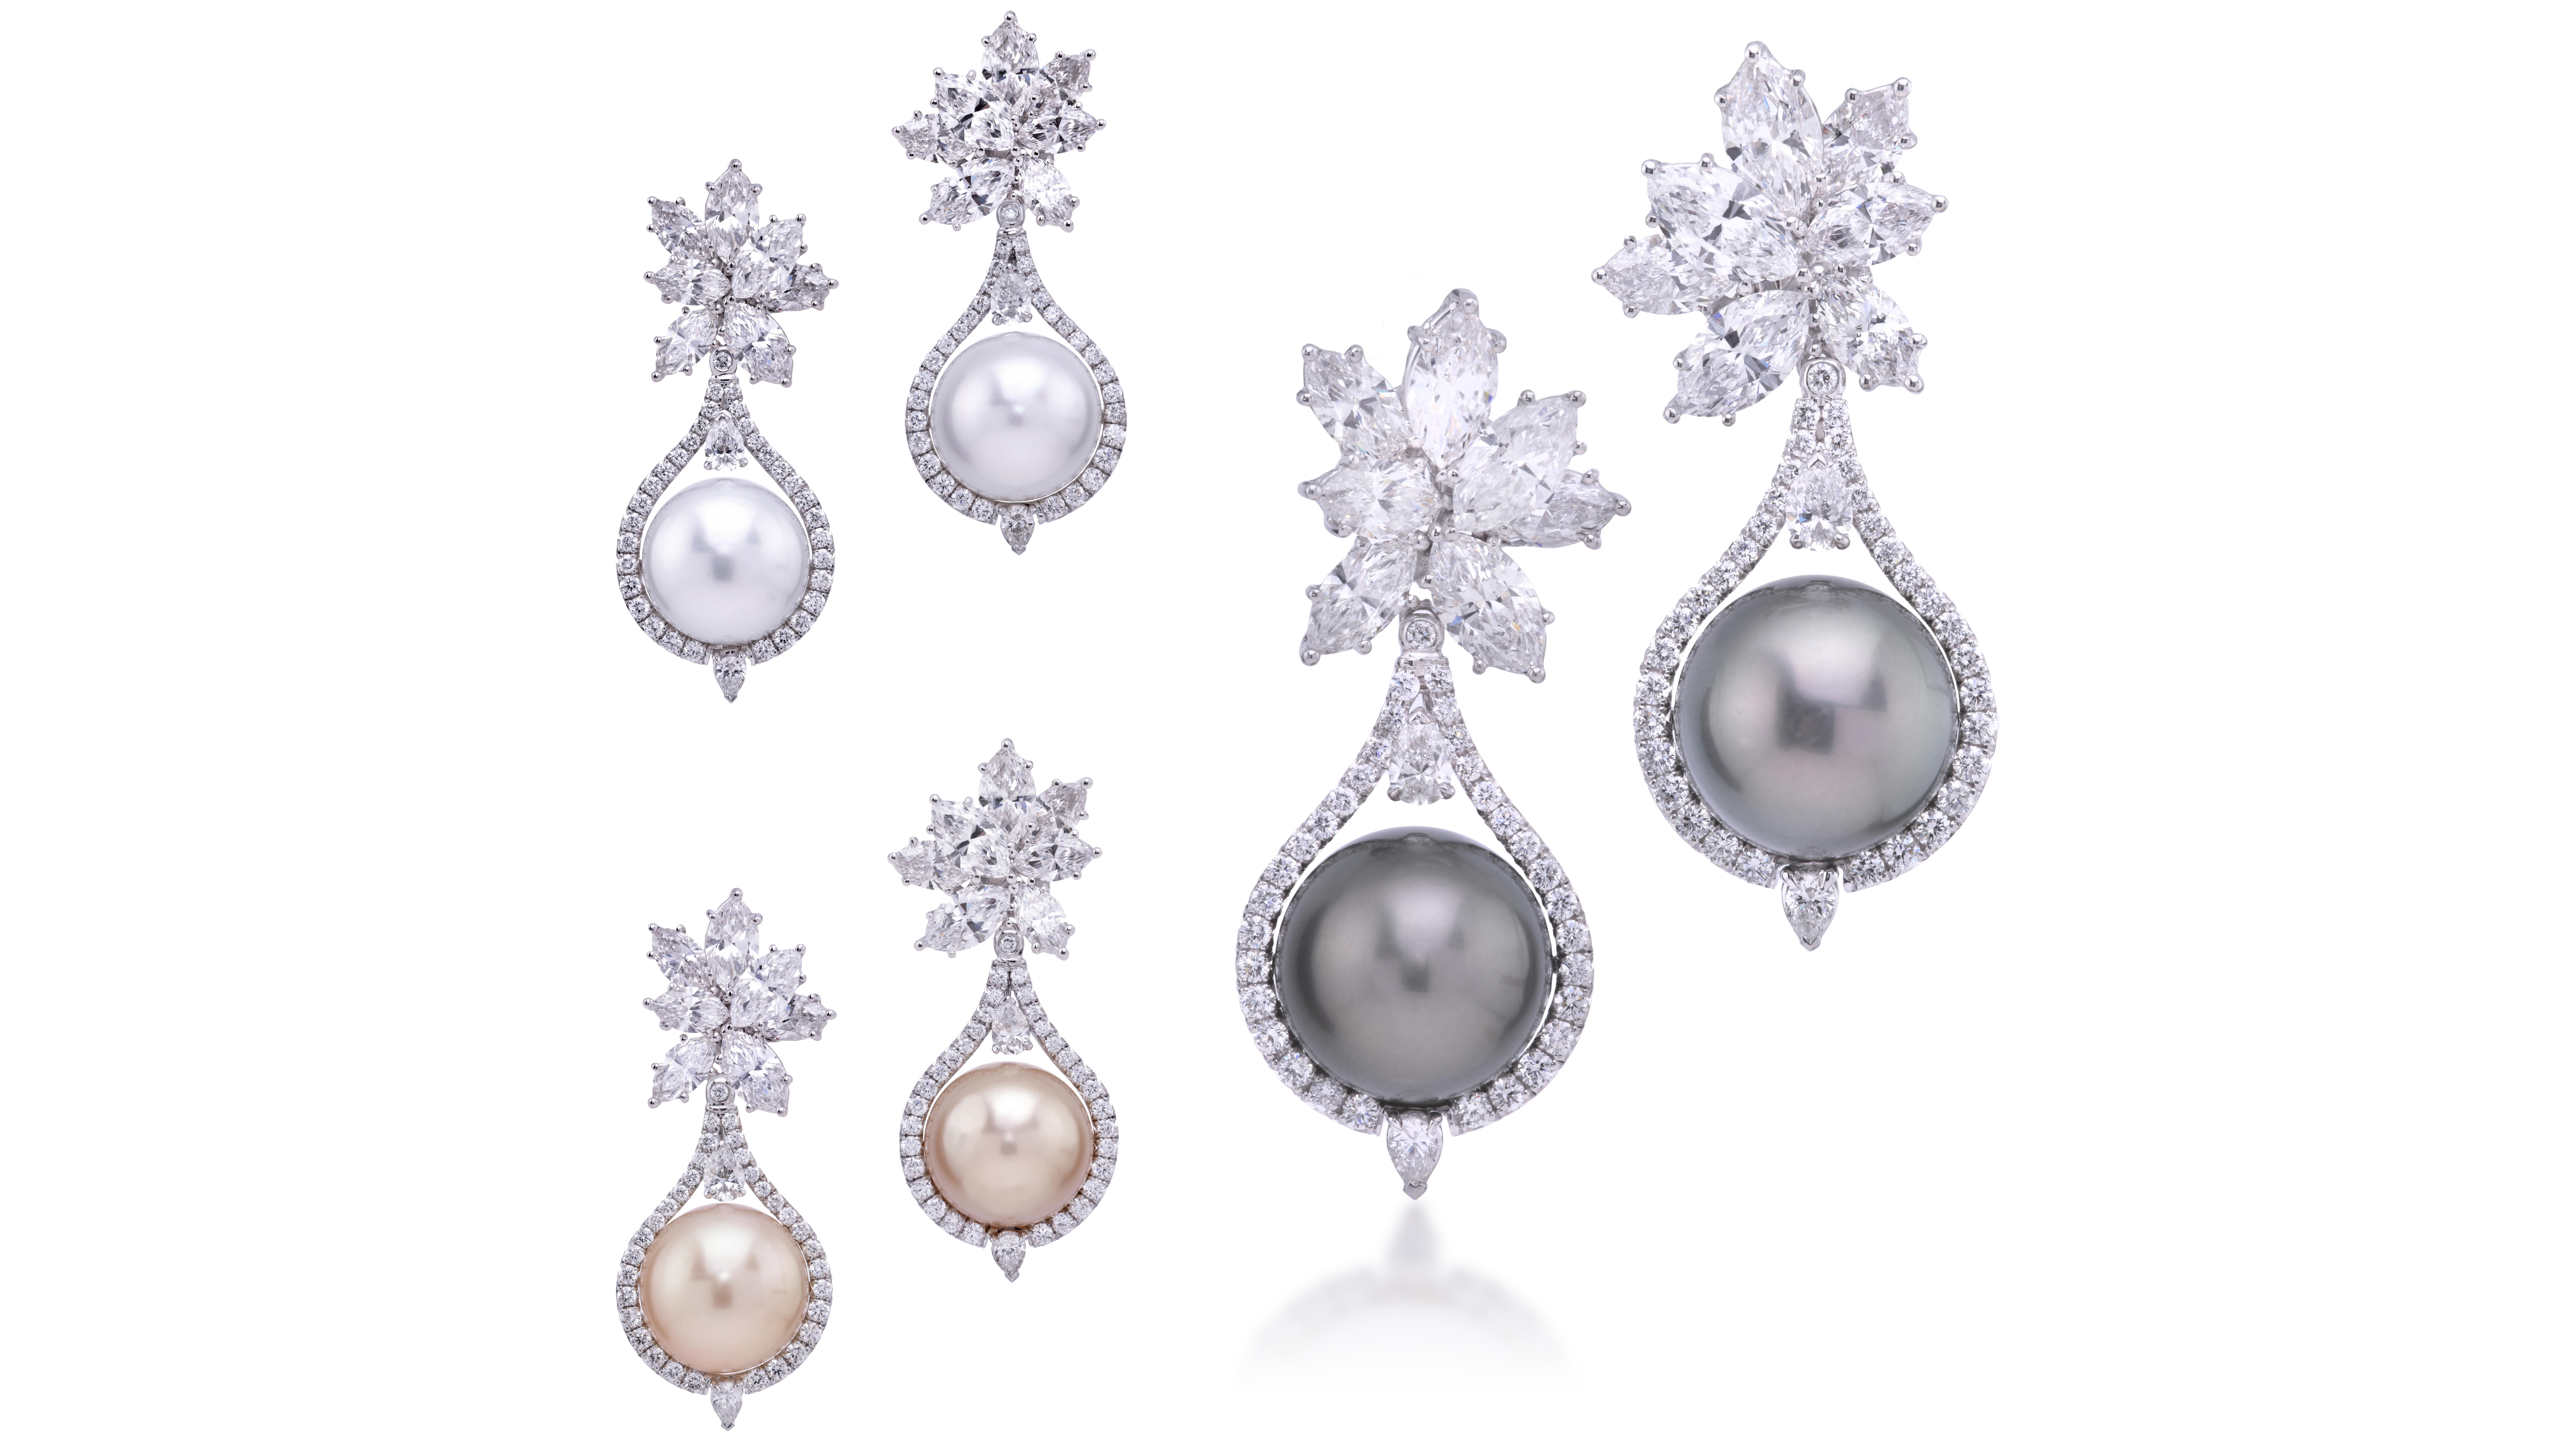 Lugano jewelry: diamond and pearl earrings